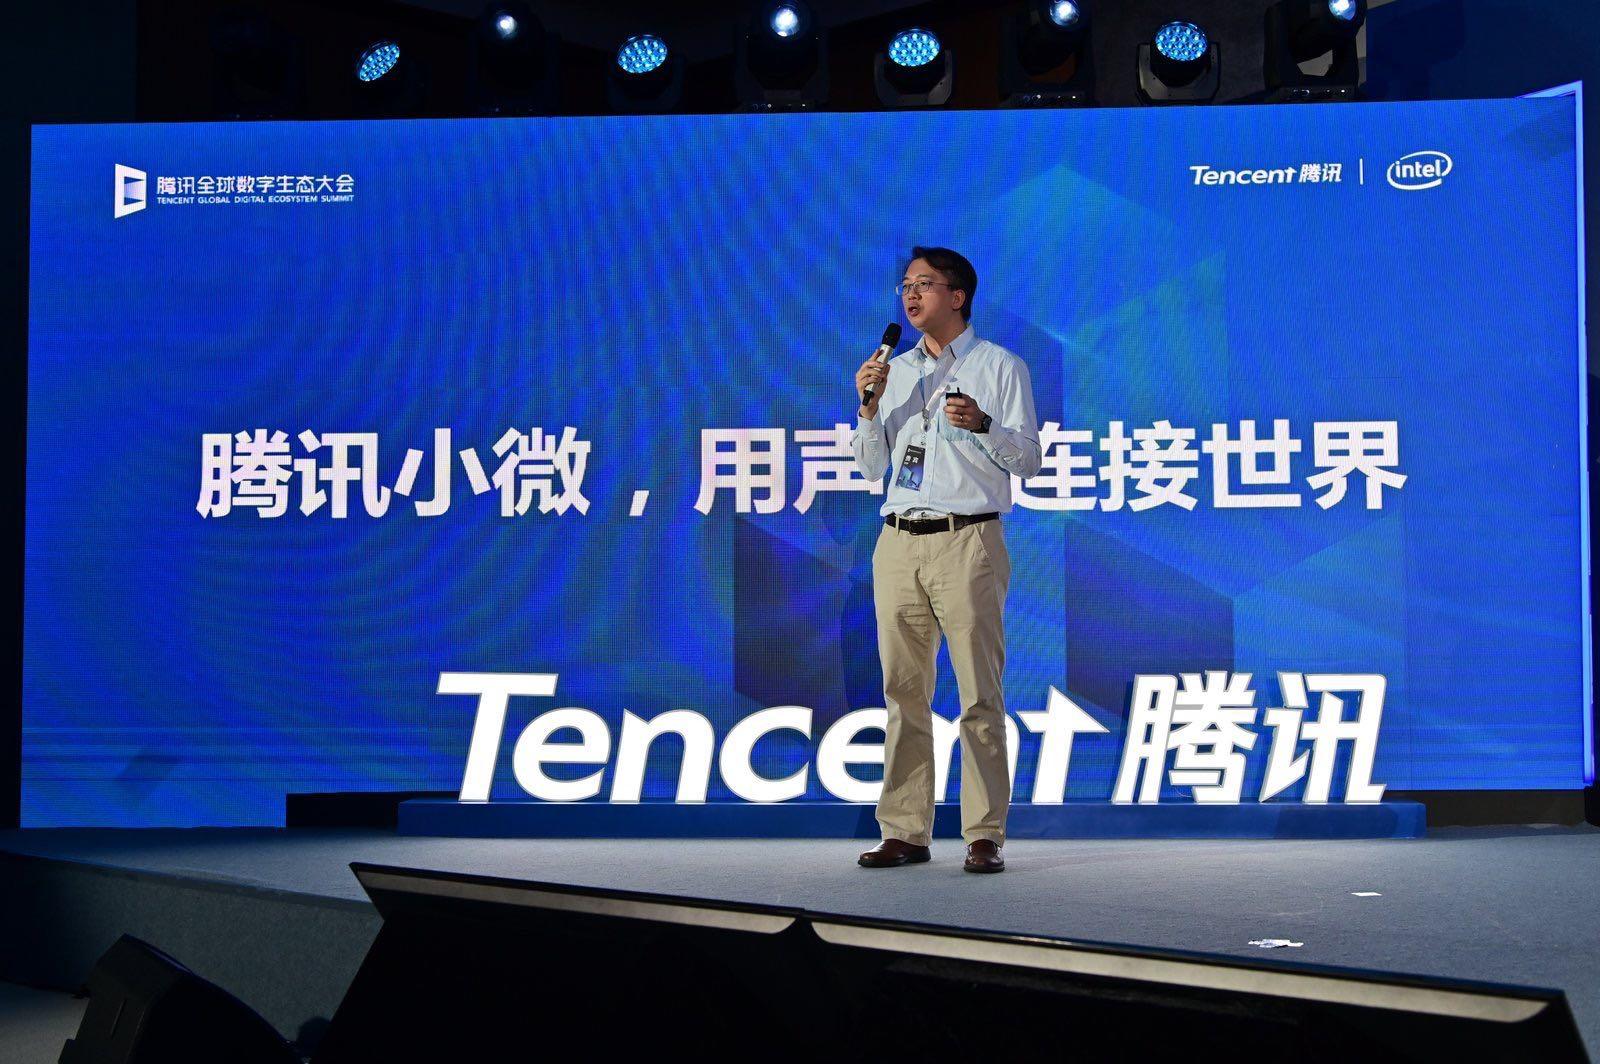 Tam delivers talk against Tencent backdrop